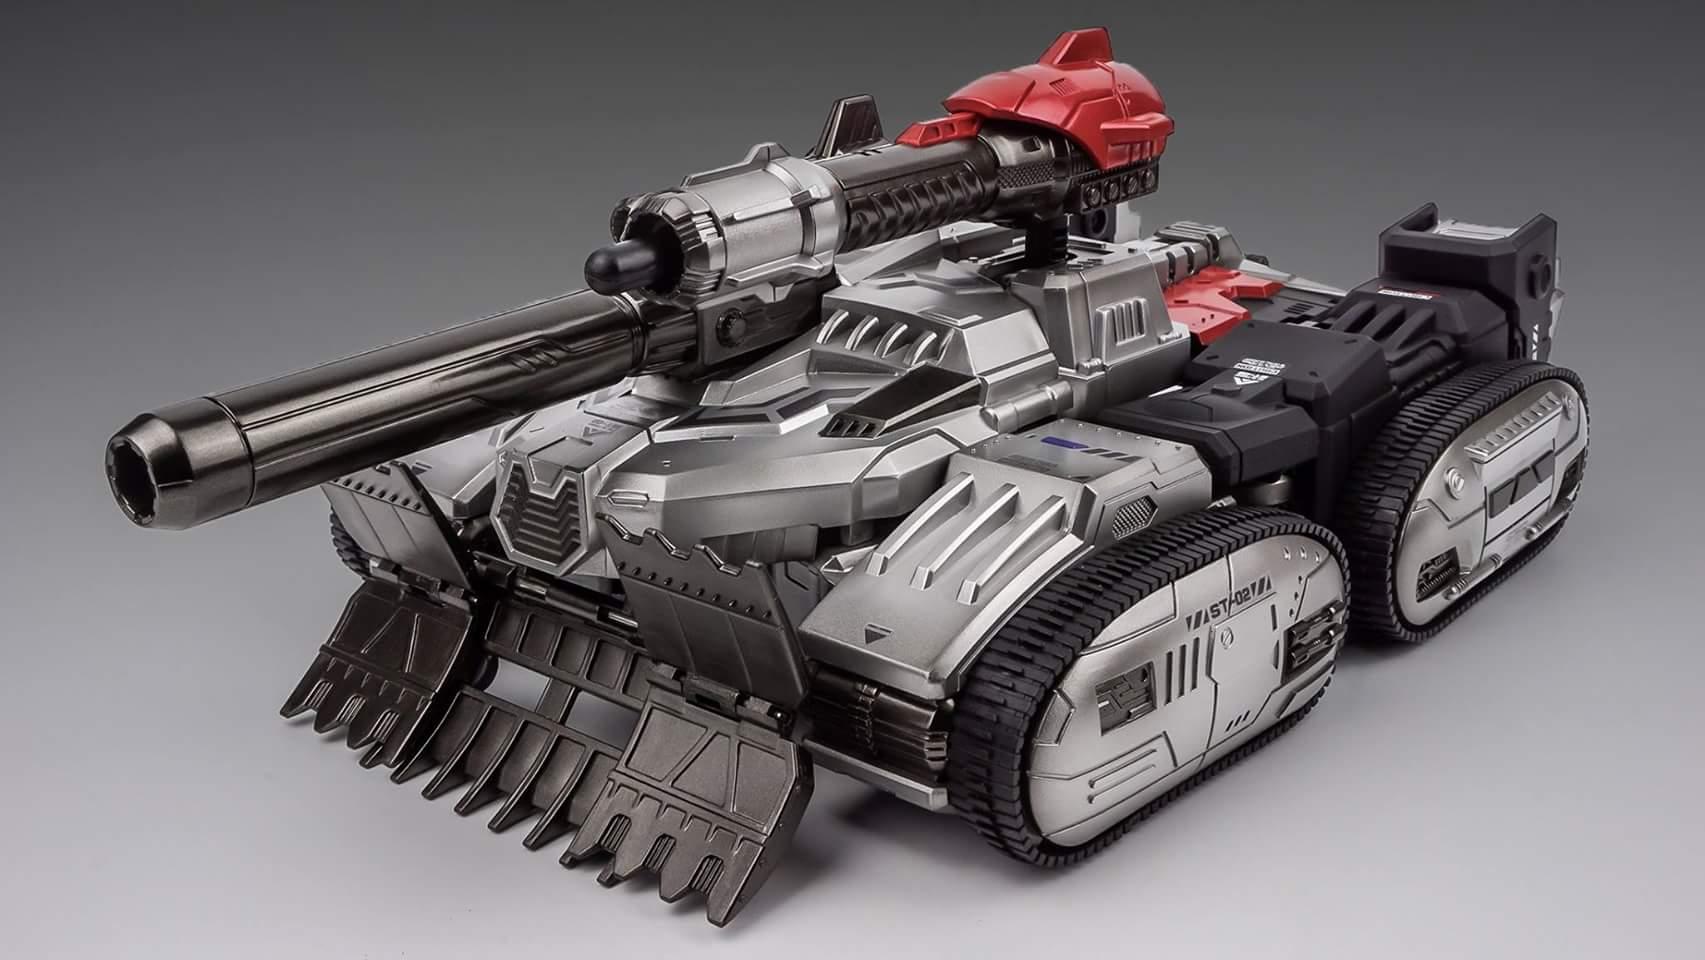 [SparkToys] Produit Tiers - ST - aka War Within: Optimus, Mégatron, Grimlock/La Menace, etc - Page 2 KhBMoyRp